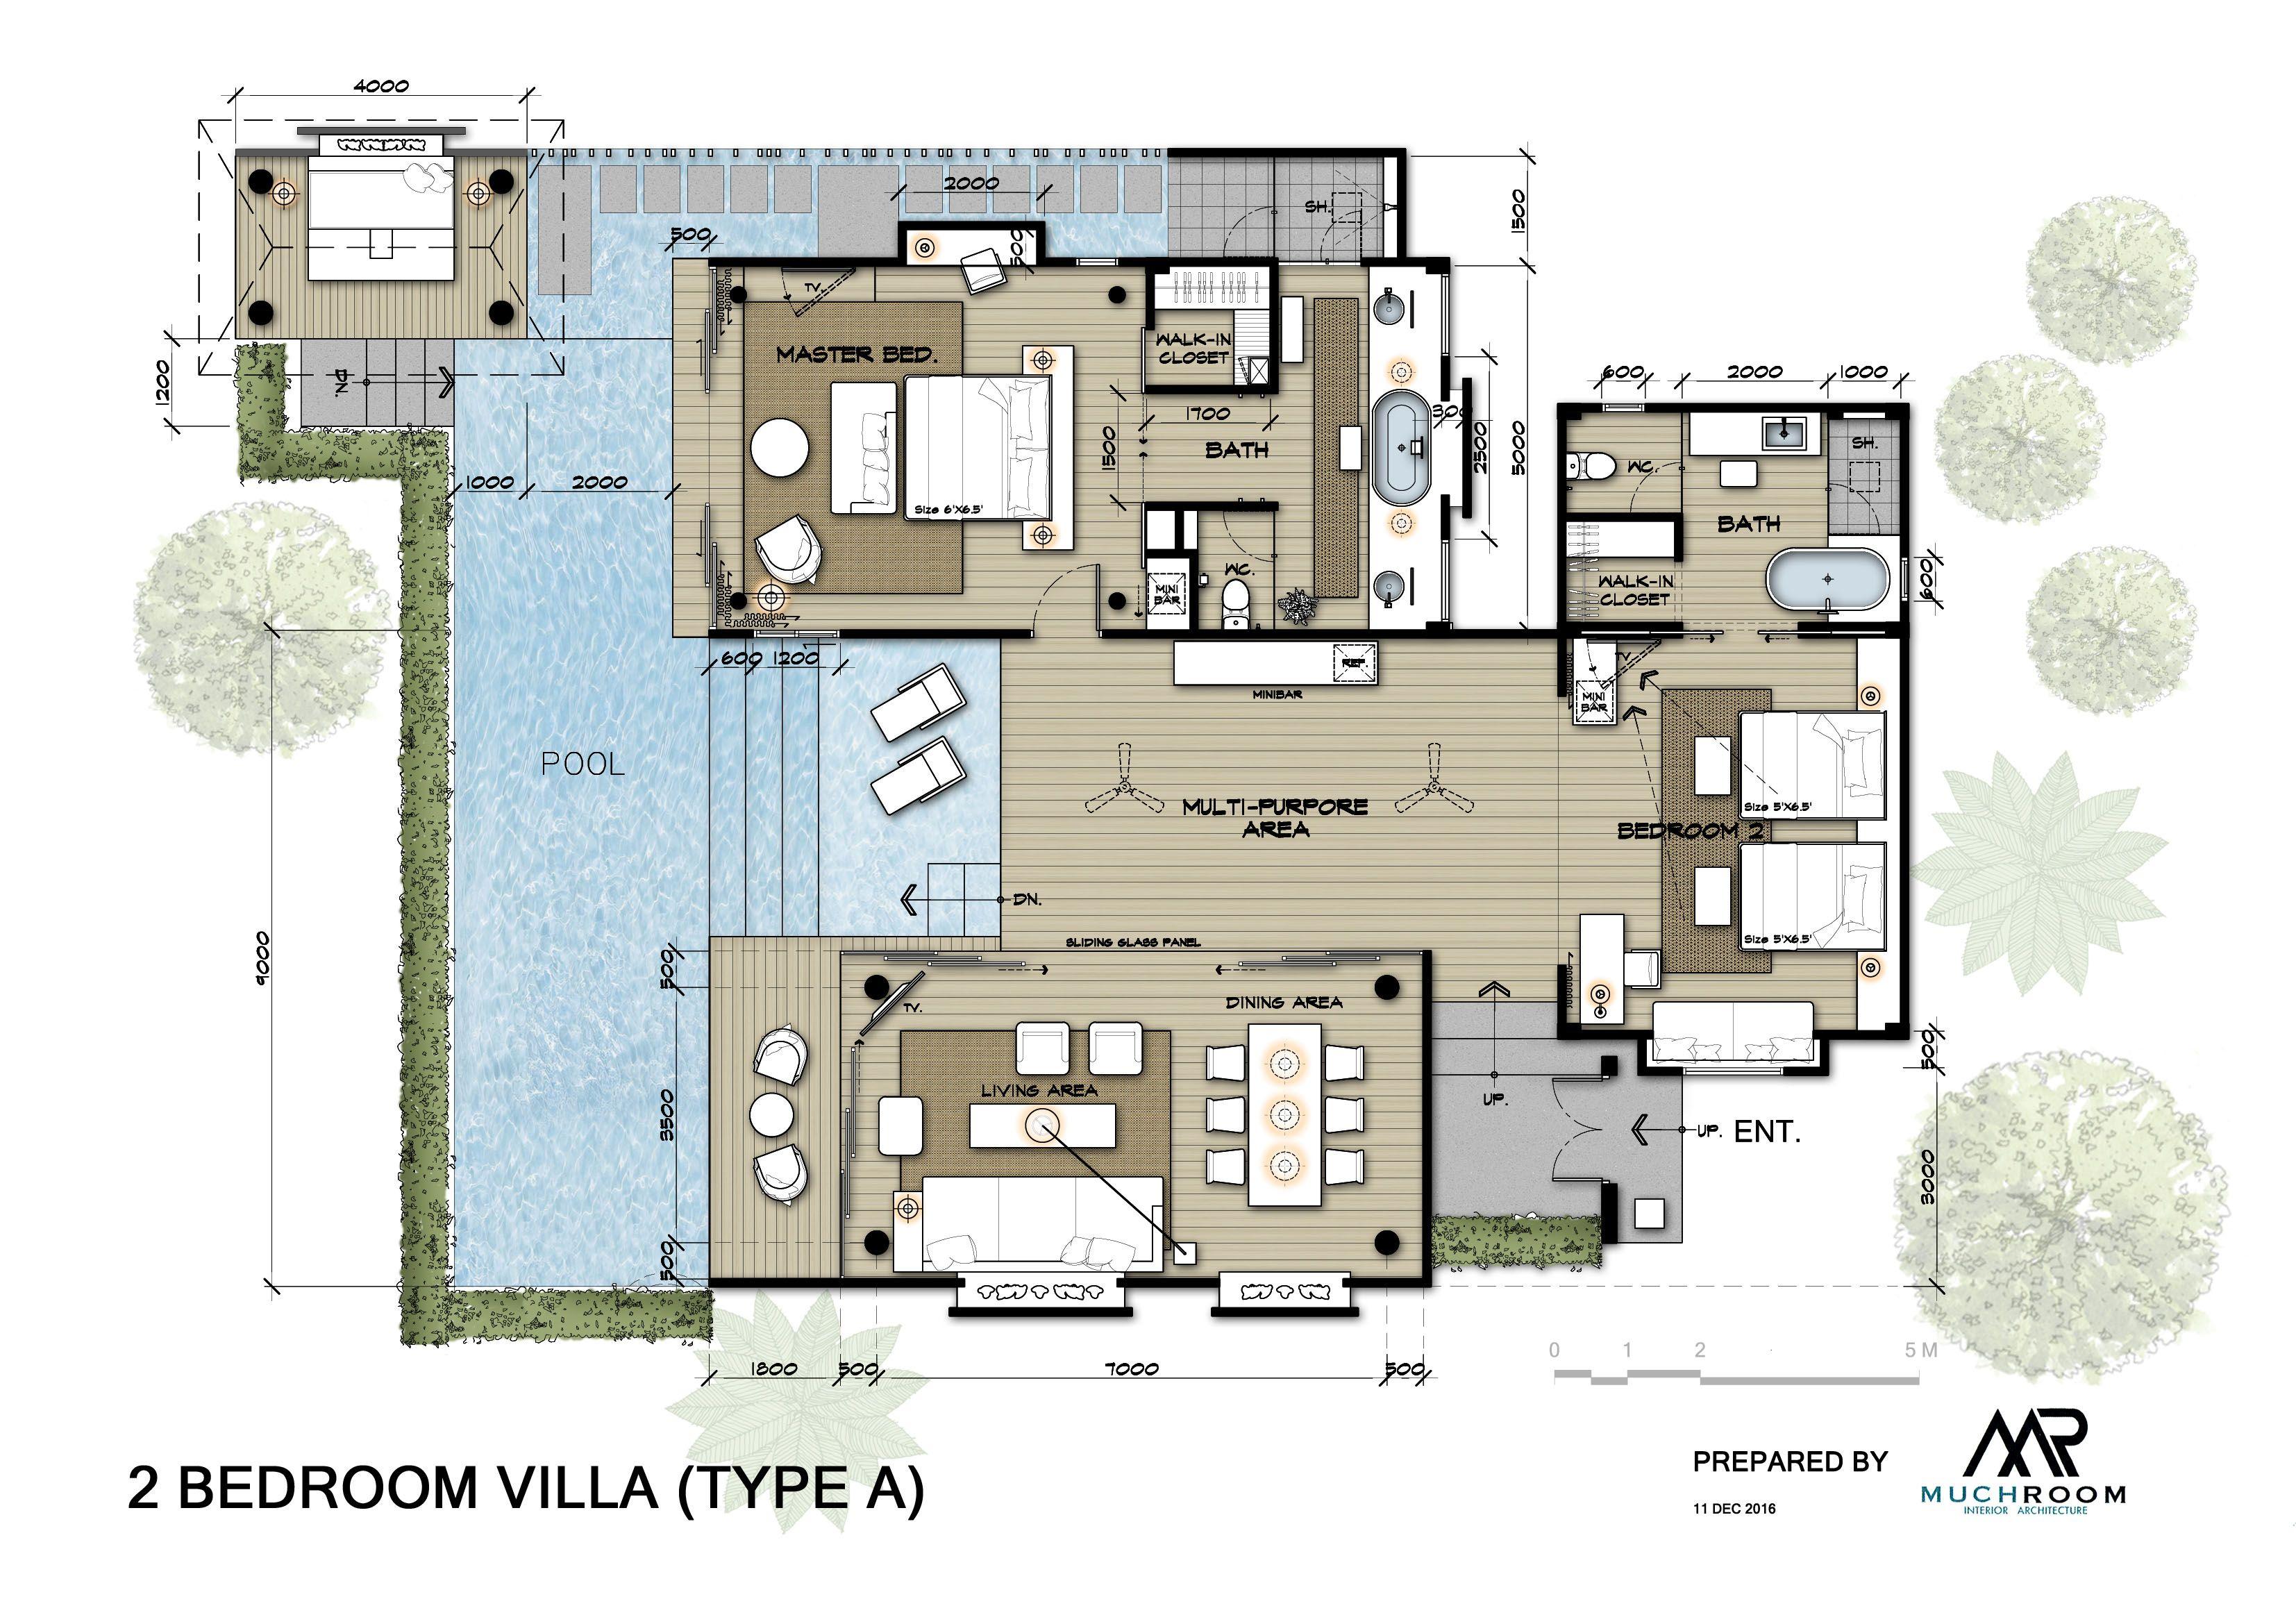 Pool Villas A Plan Modern House Floor Plans Small House Floor Plans House Plans